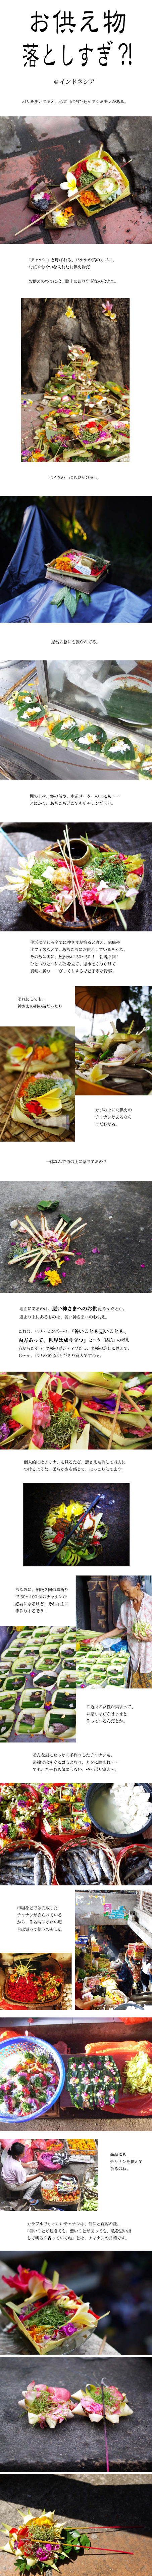 tomako160818.jpg